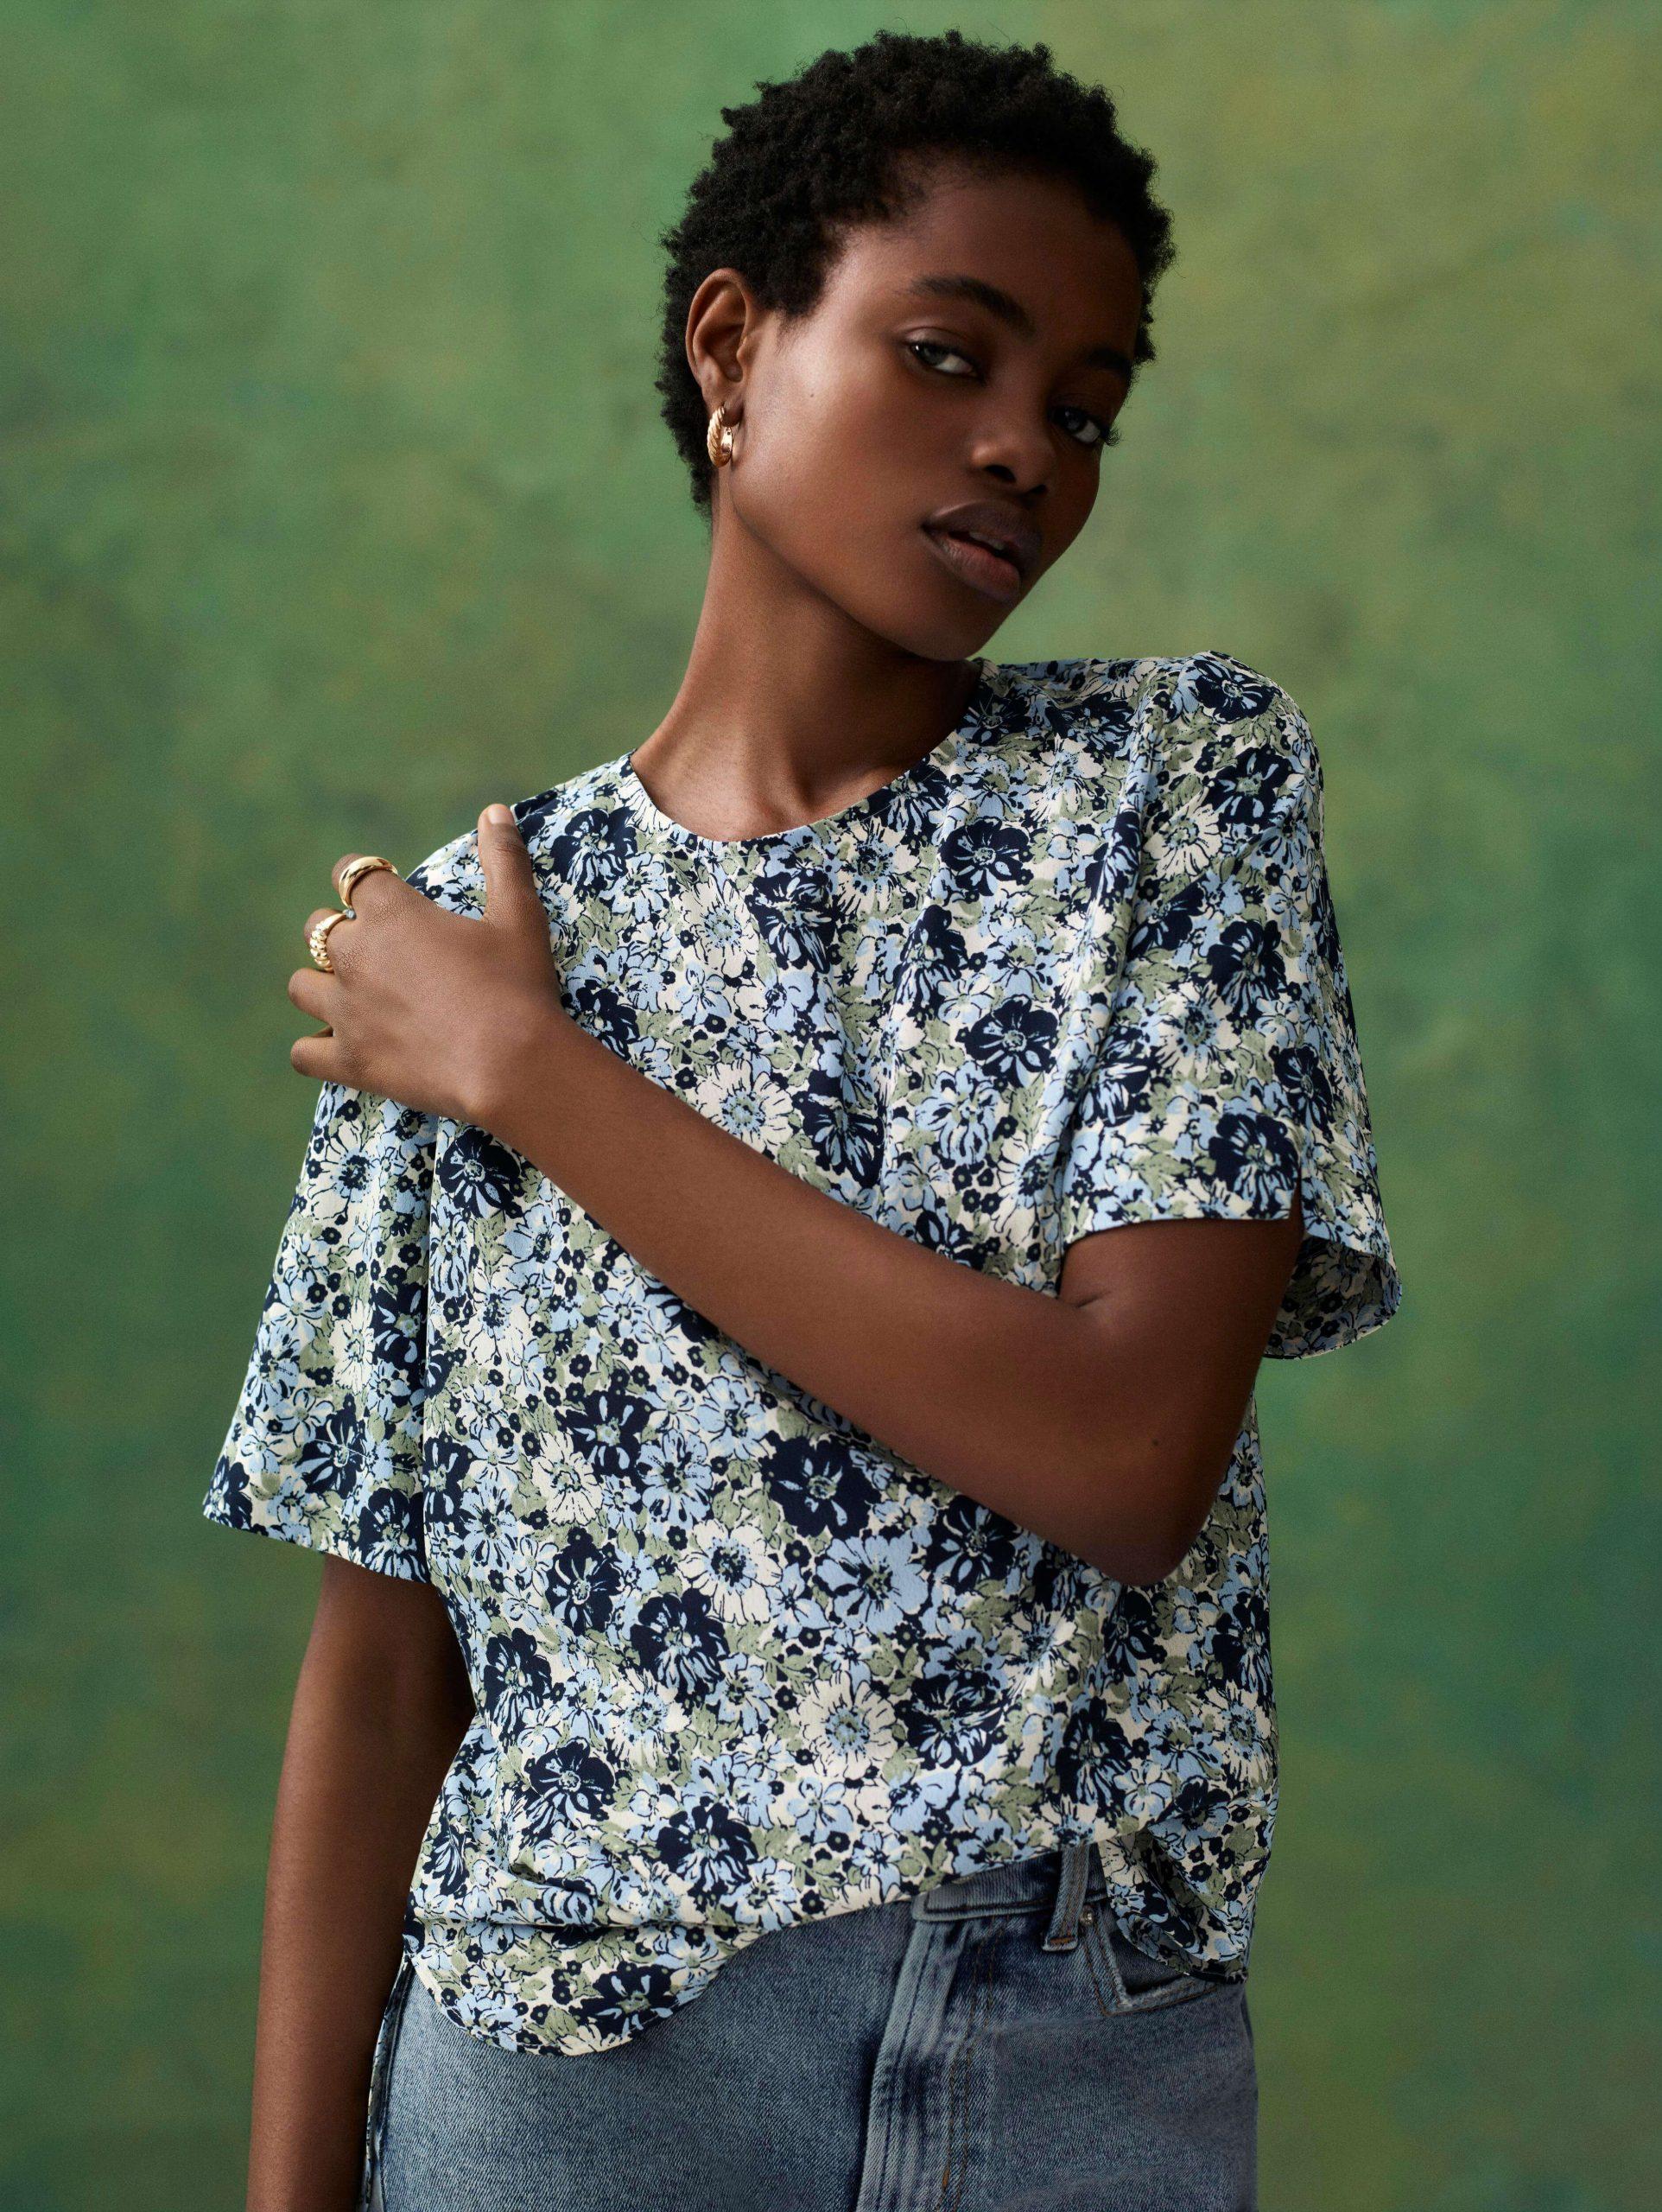 Camiseta floral mujer